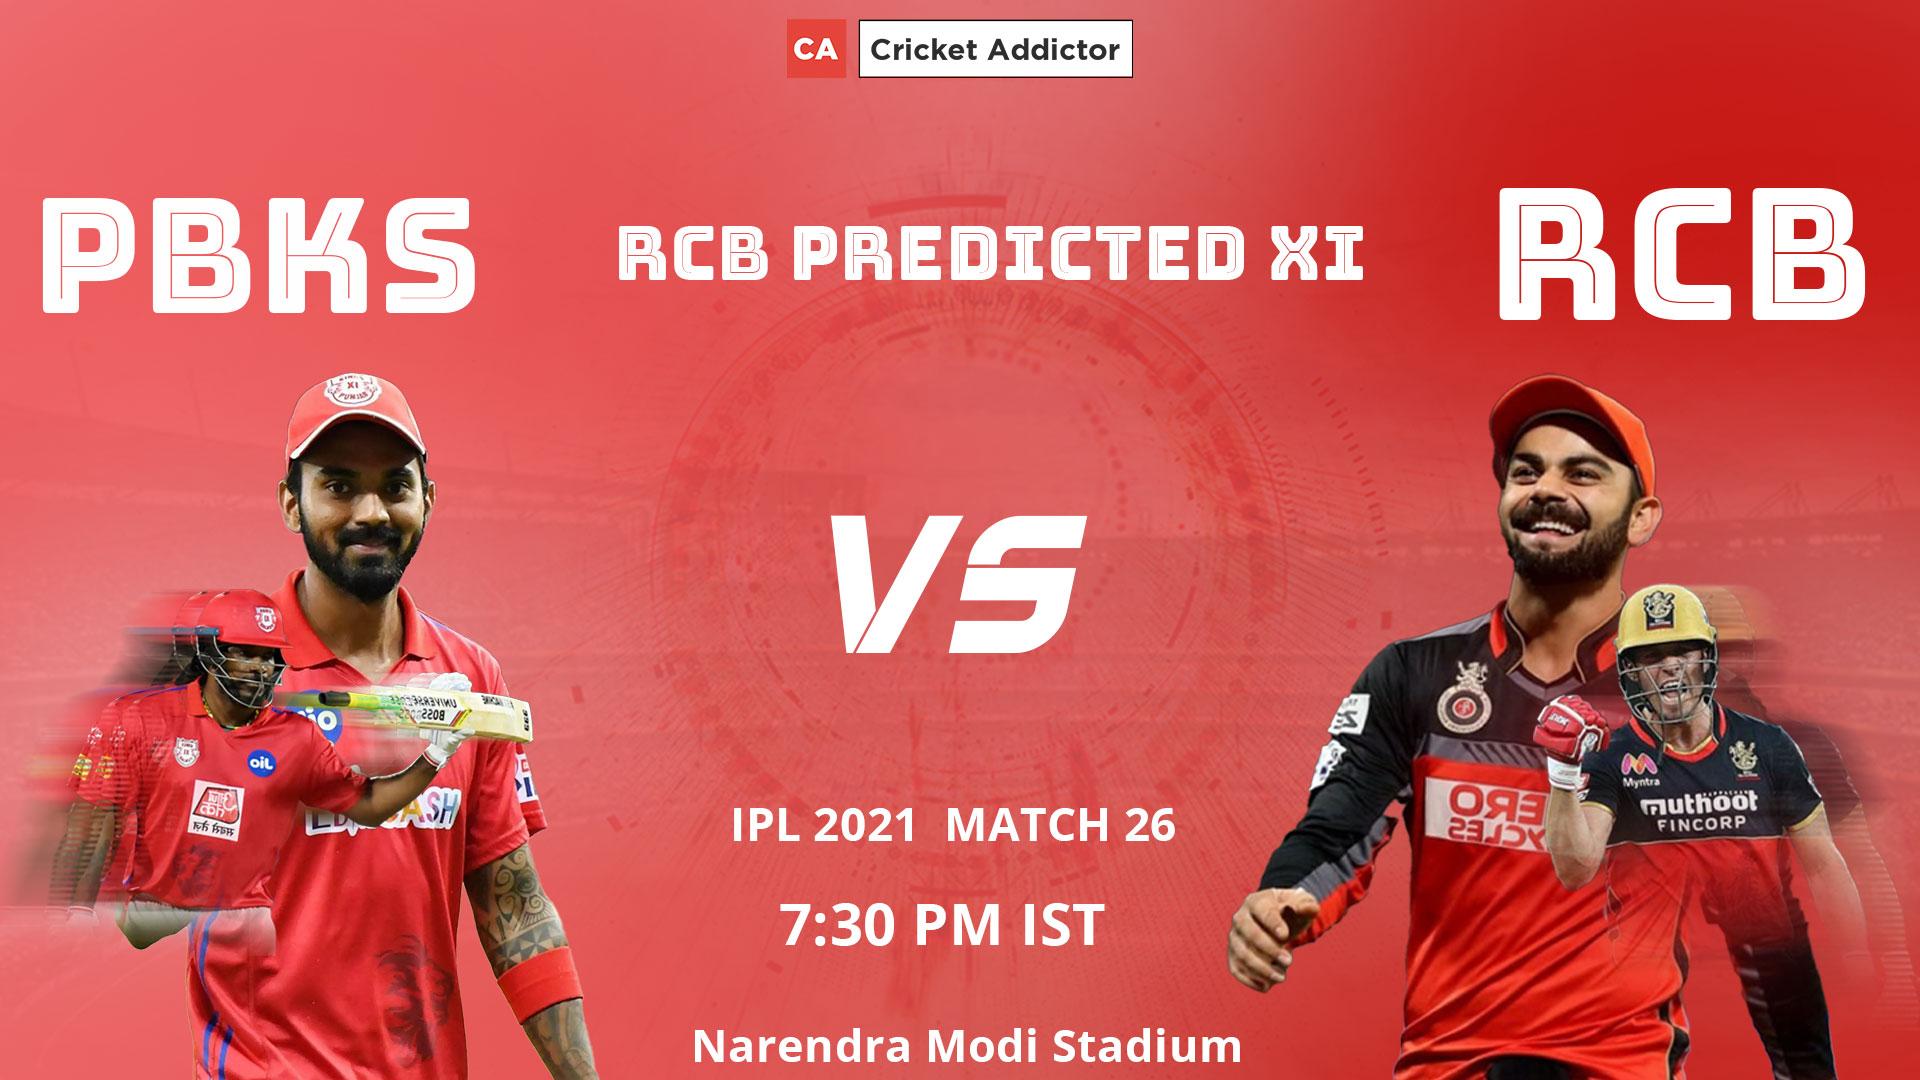 IPL 2021, RCB, Royal Challengers Bangalore, predicted playing XI, playing XI, PBKS vs RCB